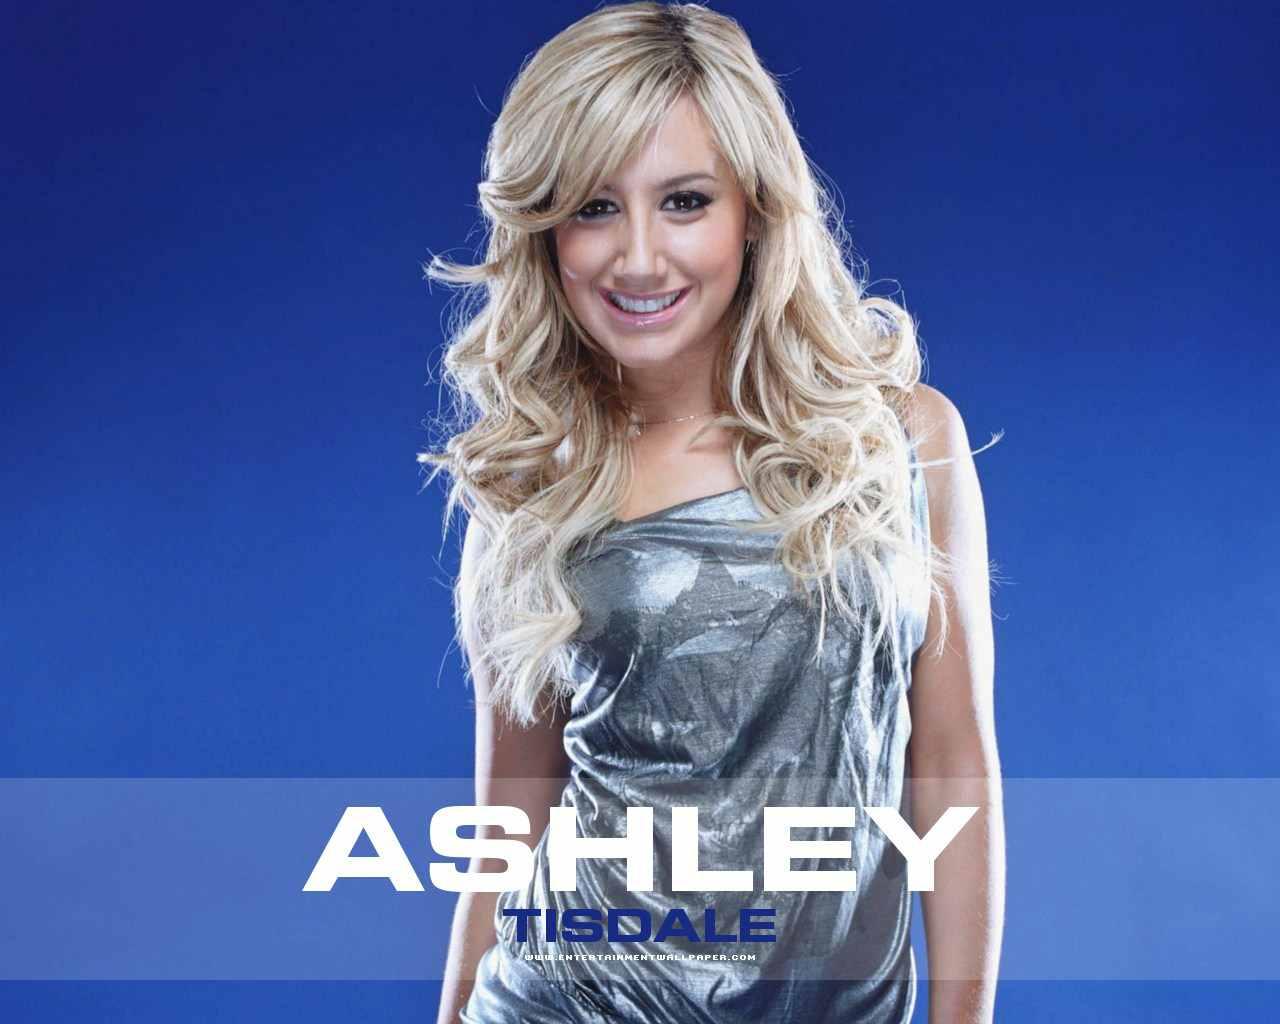 http://4.bp.blogspot.com/-7FkpElqFTjA/TiWXUNOJH1I/AAAAAAAAIdU/iIoV3-VPnPg/s1600/ashley_tisdale03.jpg